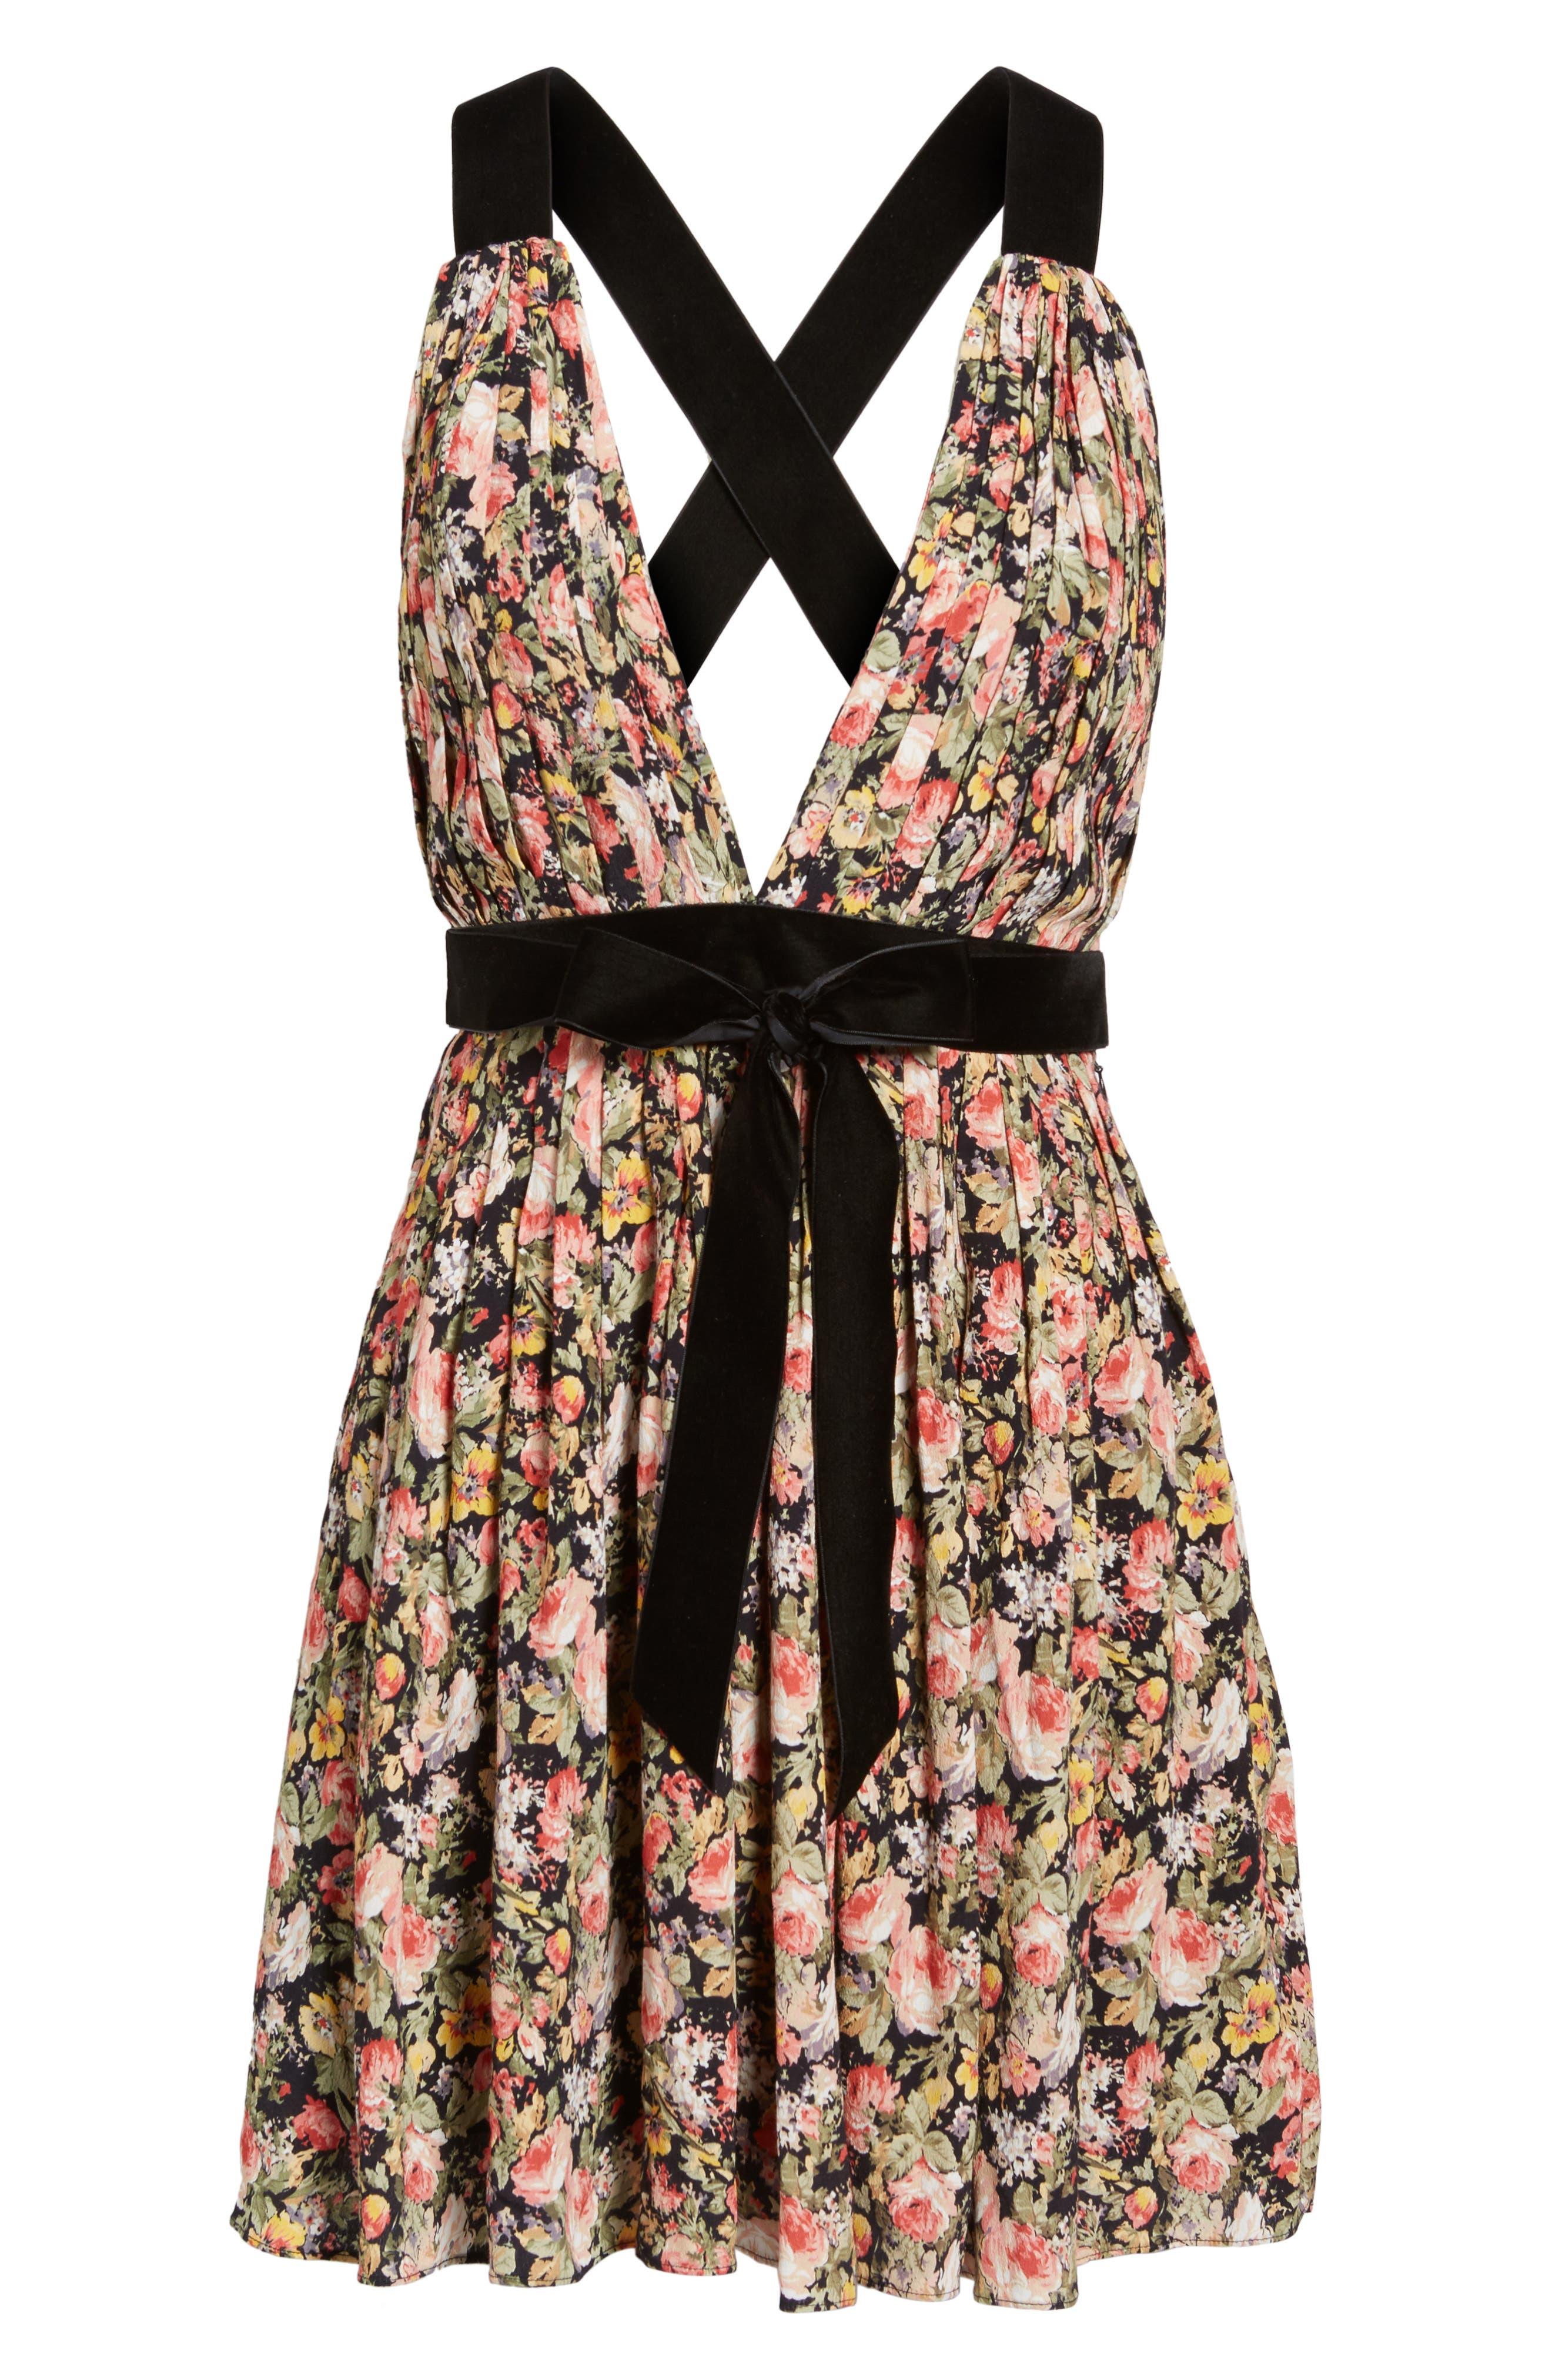 April Floral Minidress,                             Alternate thumbnail 6, color,                             019